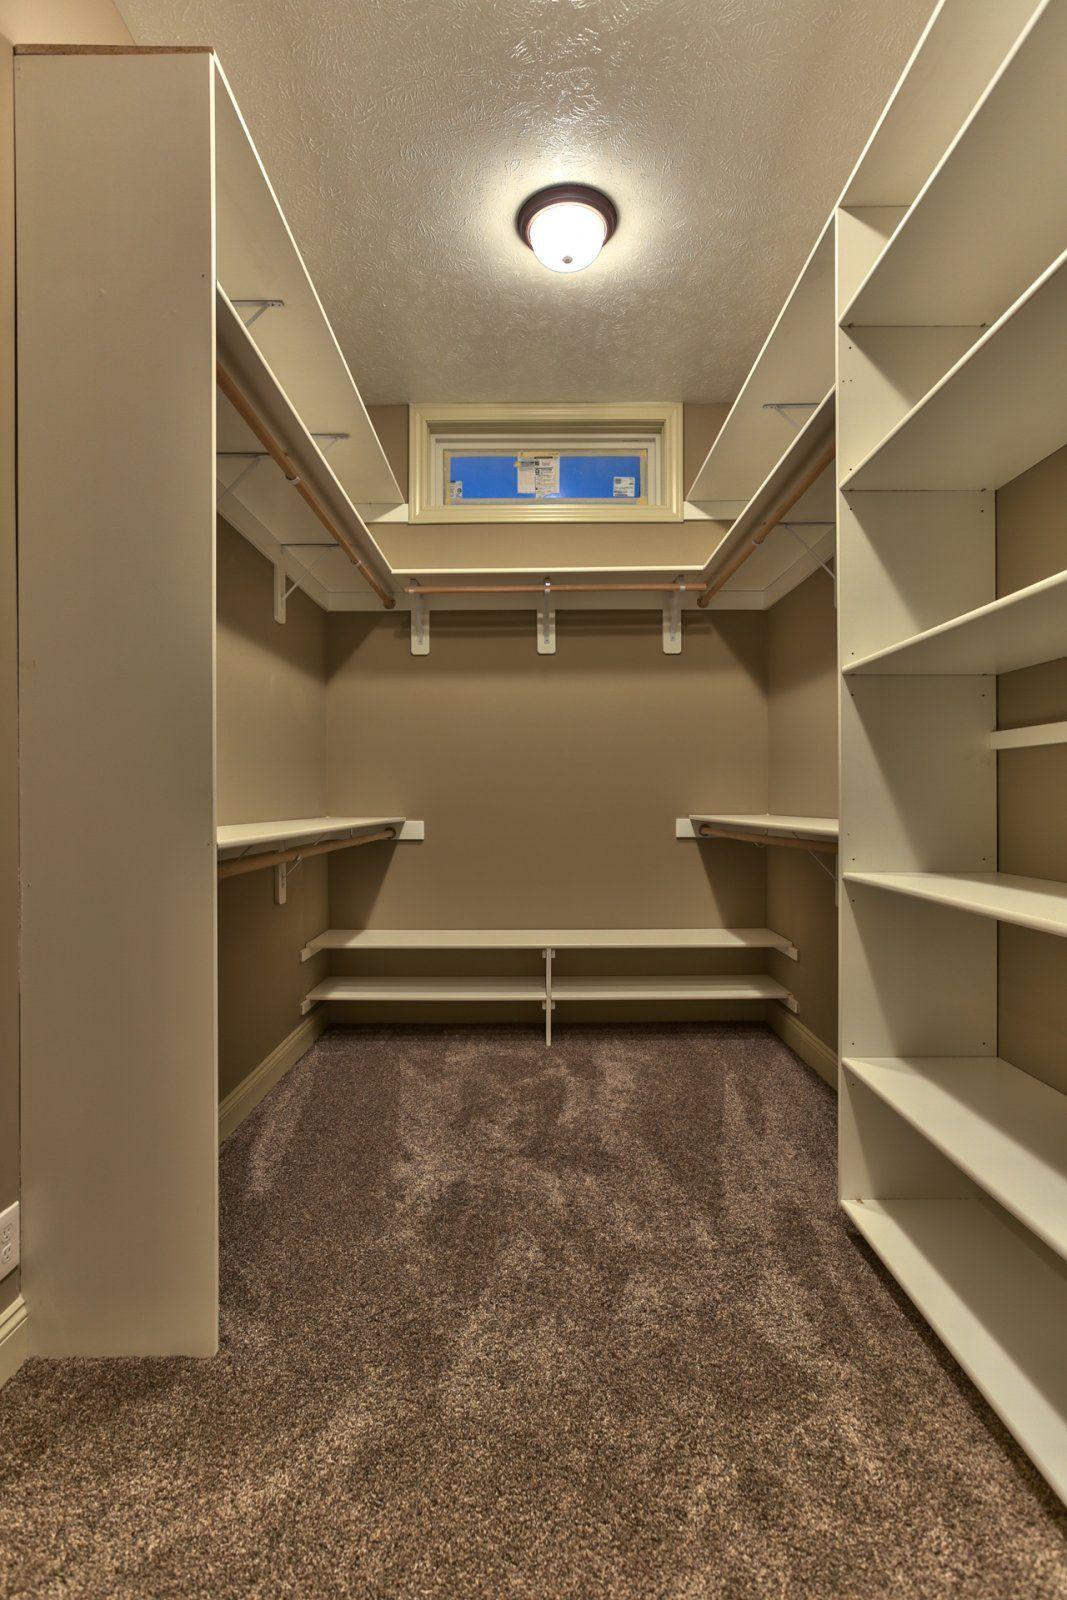 12 Small Walk In Closet Ideas And Organizer Designs Bedroom